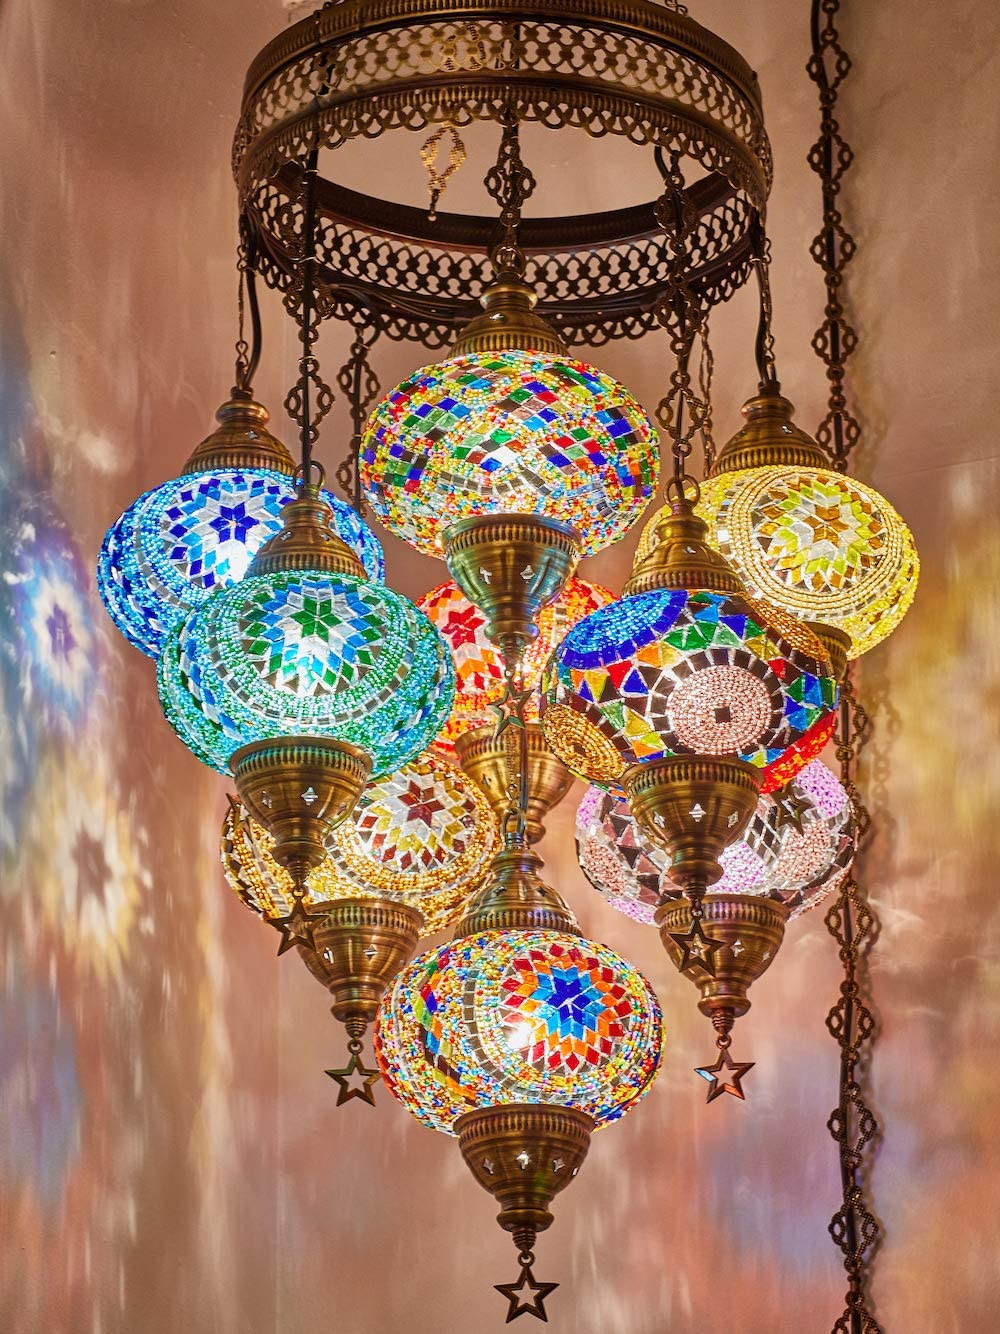 Customizable Globes DEMMEX 2019 Hard-Wired or PLUGIN 1,3,5,7,9 Globes Chandelier Lights Turkish Moroccan Mosaic Ceiling Hanging Pendant Chandelier Light Lighting 9 Big Globes PlugIN, 41